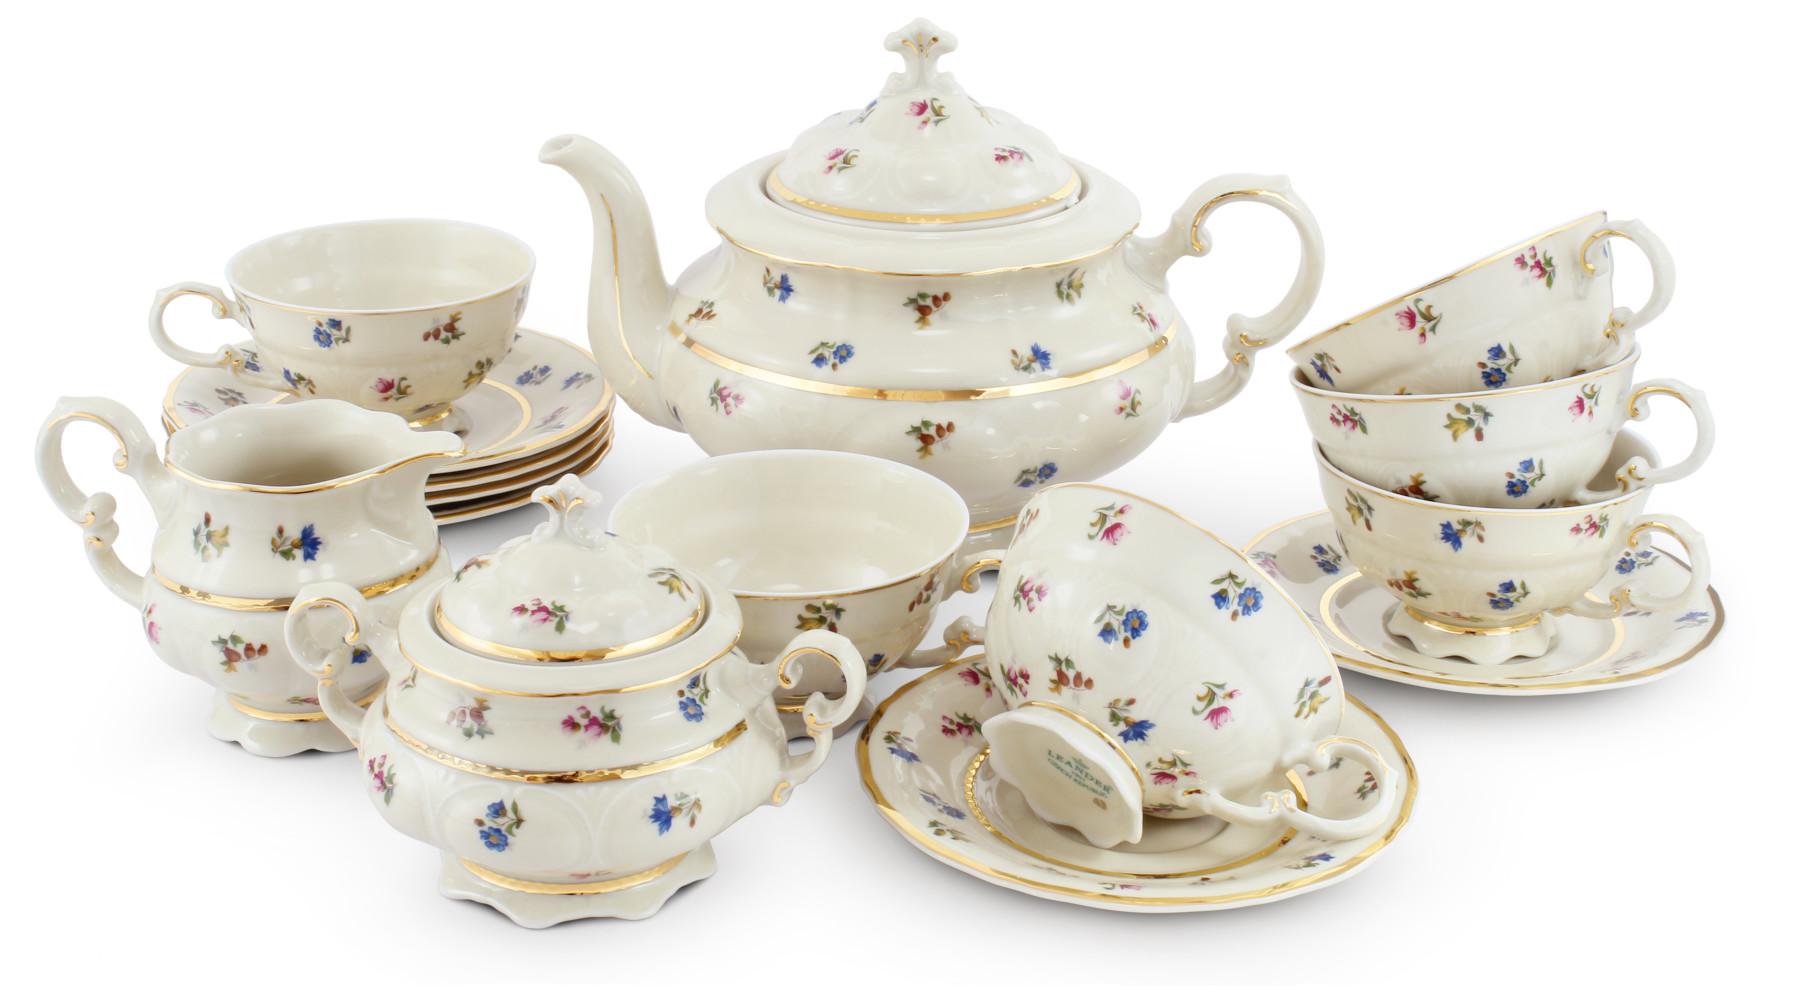 Tea set 15-piece - Floral celebration